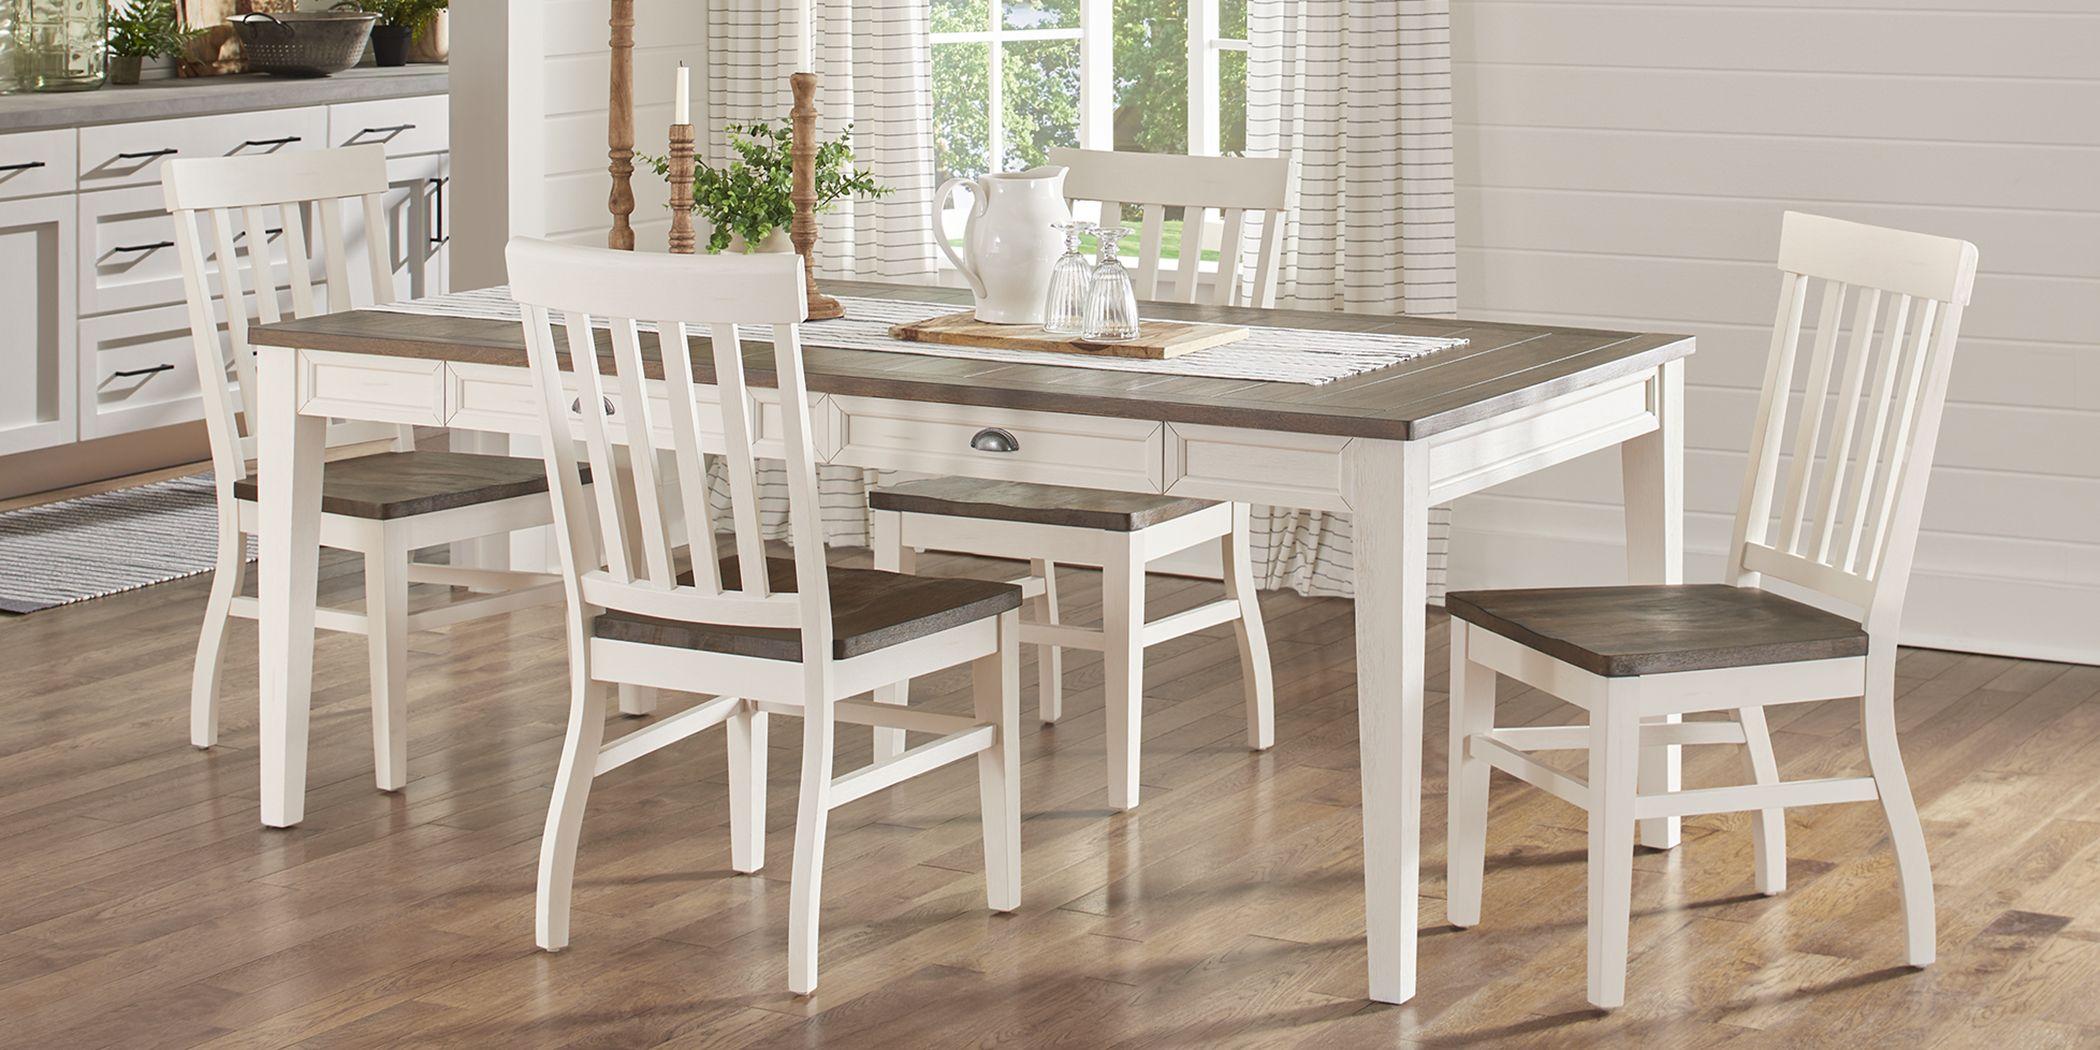 Keston White 5 Pc Rectangle Dining Room